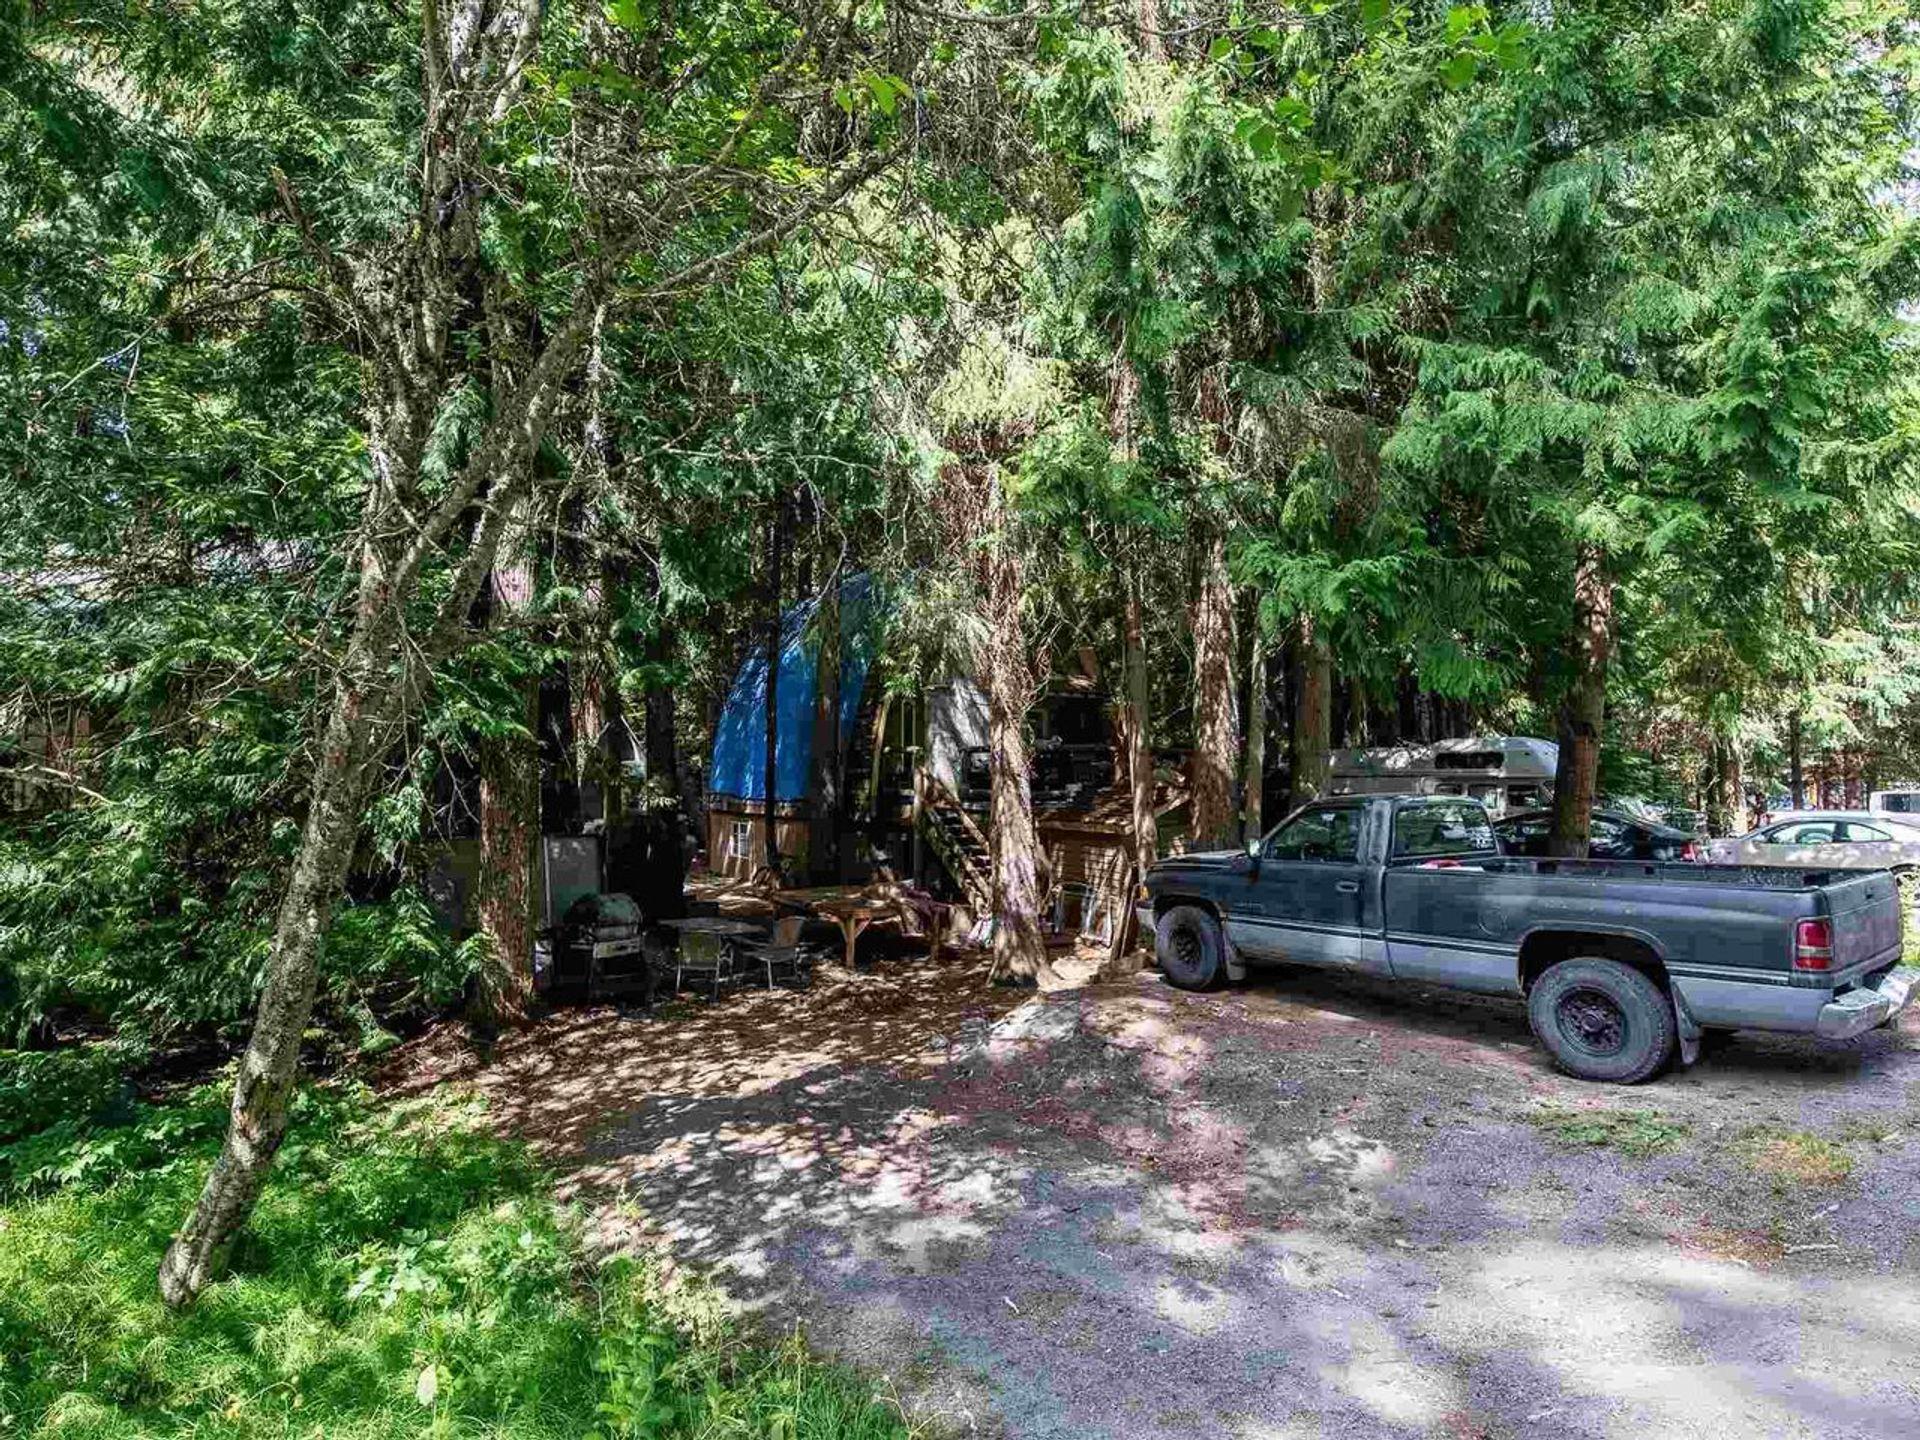 6517-balsam-way-whistler-cay-estates-whistler-12 at 6517 Balsam Way, Whistler Cay Estates, Whistler